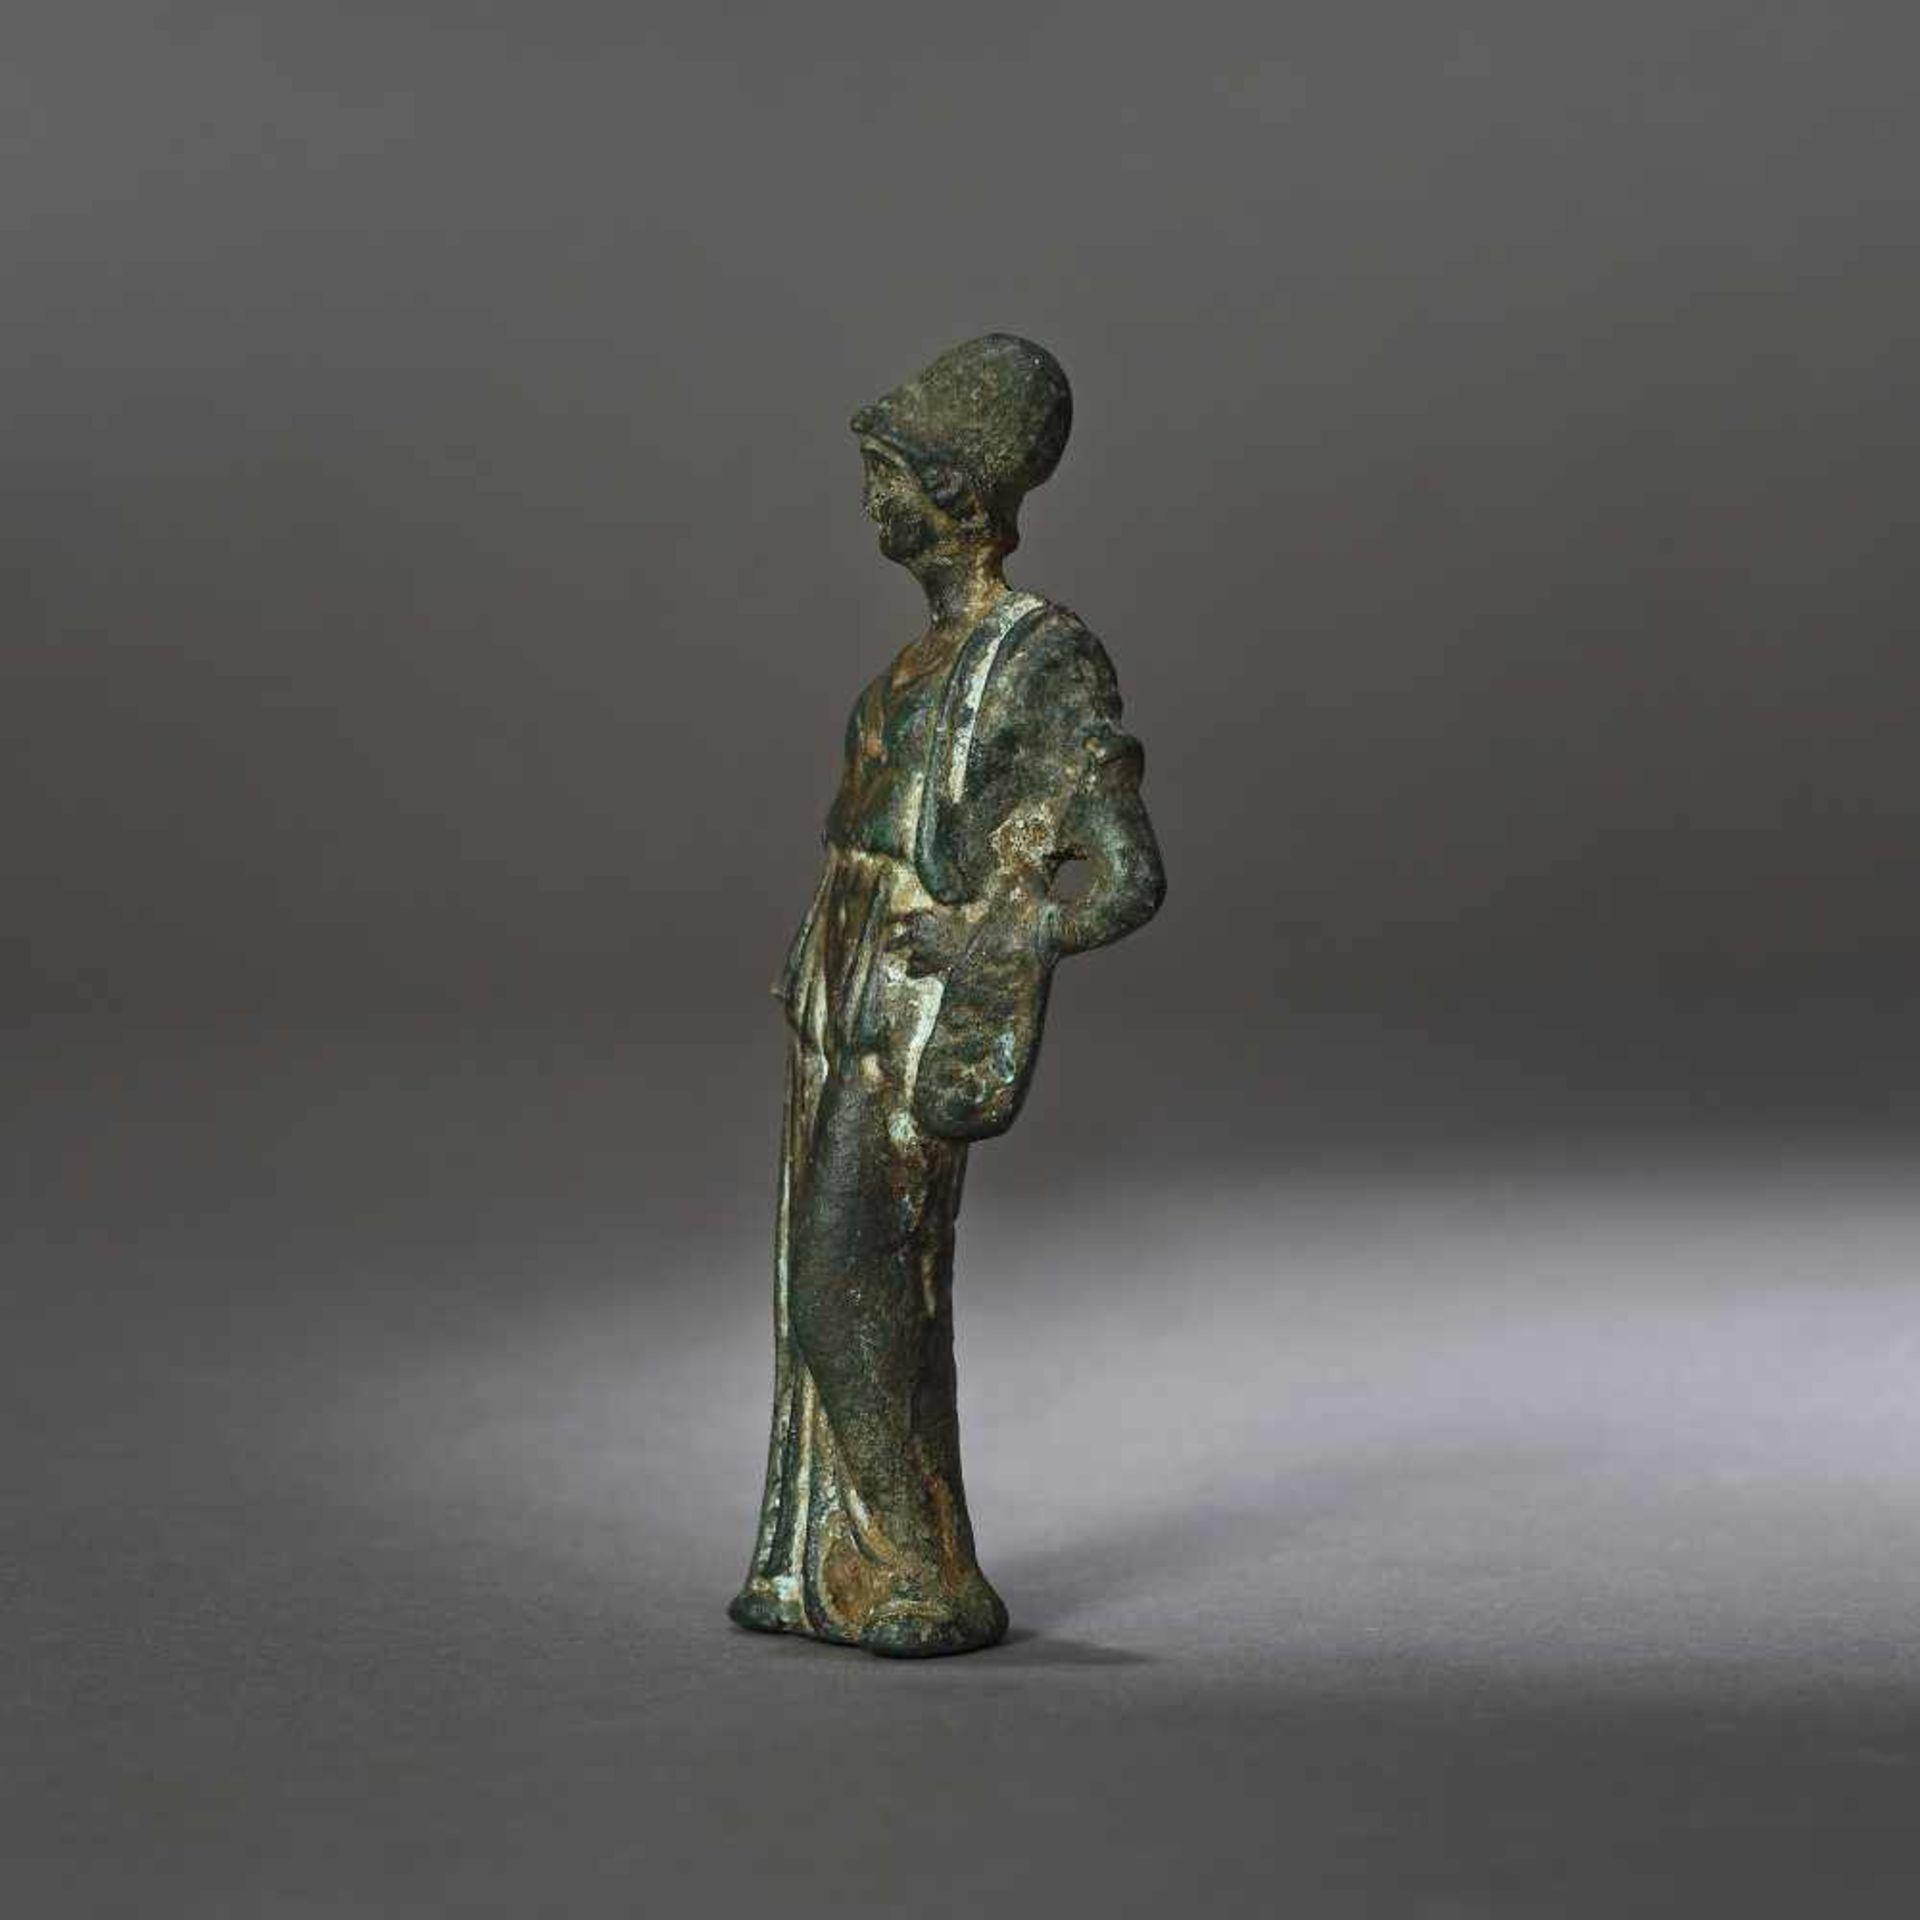 Bronze statuette depicting Athena, the goddess of wisdom, 1st century B.C. - Bild 2 aus 4